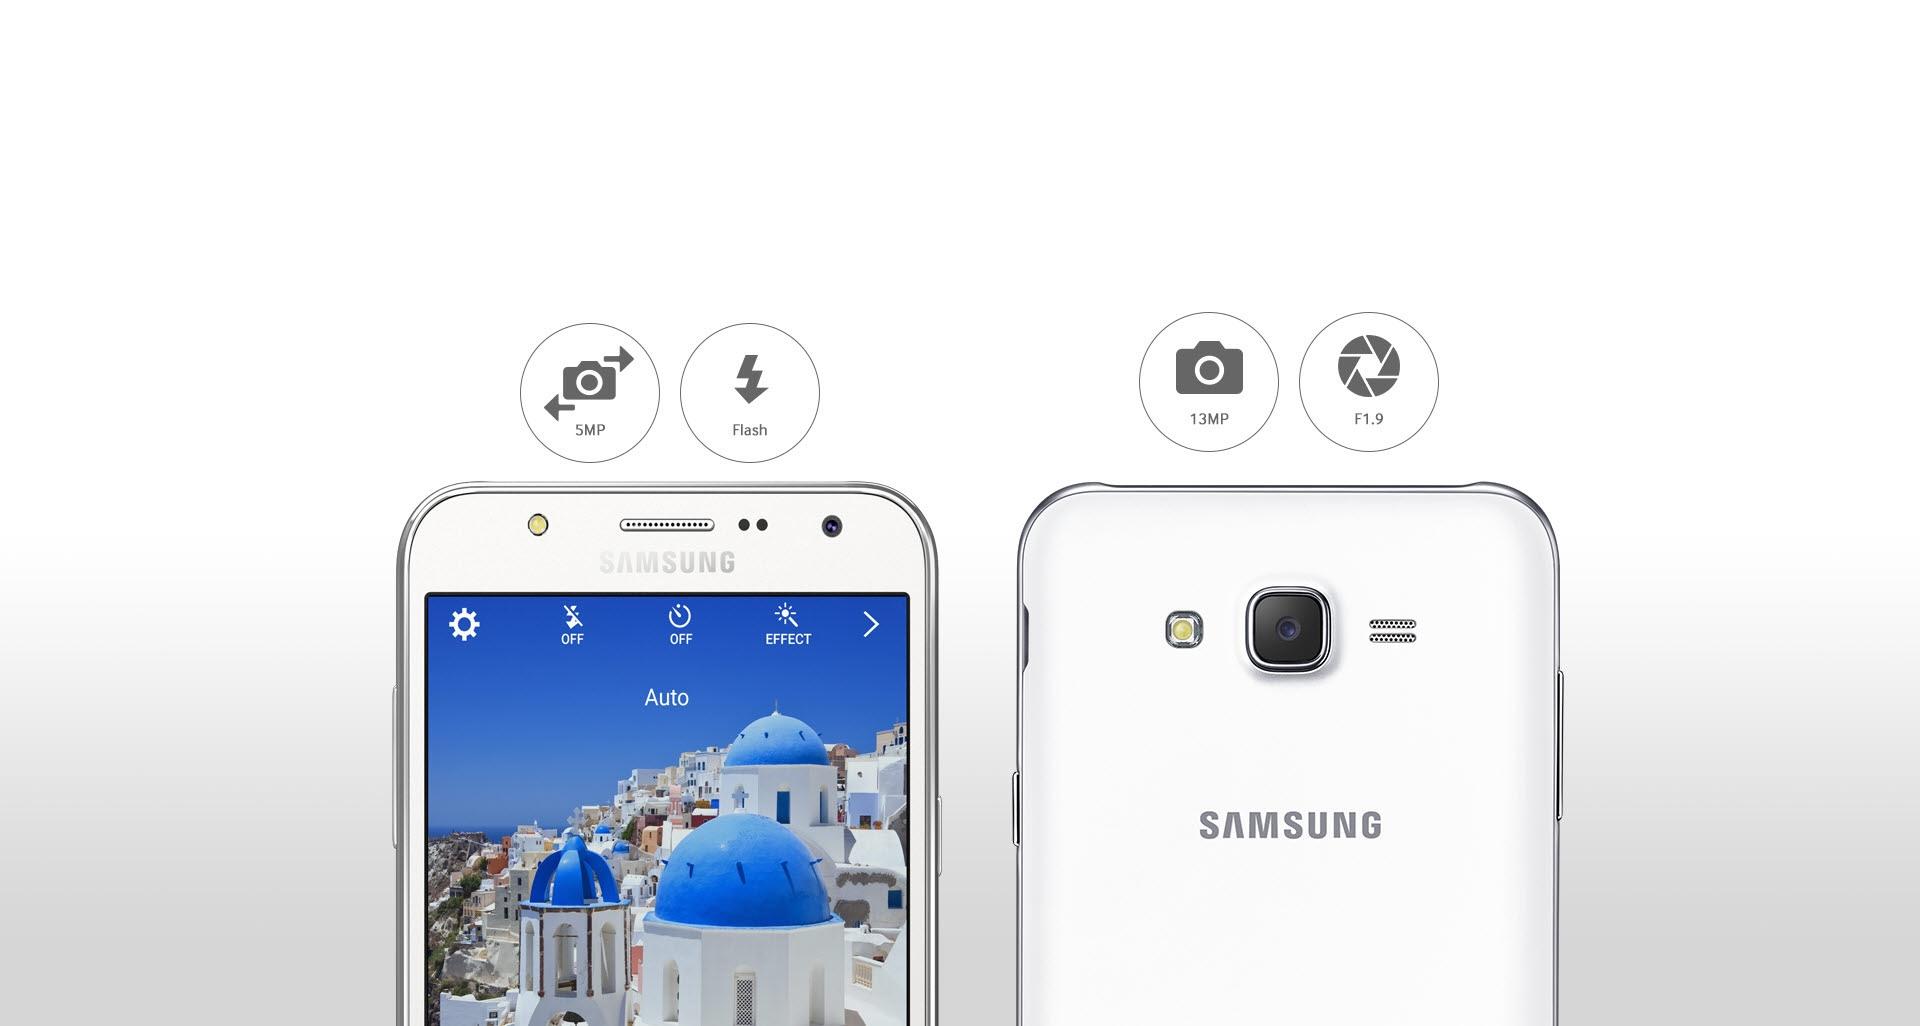 Samsung Galaxy J7 – Best Camera